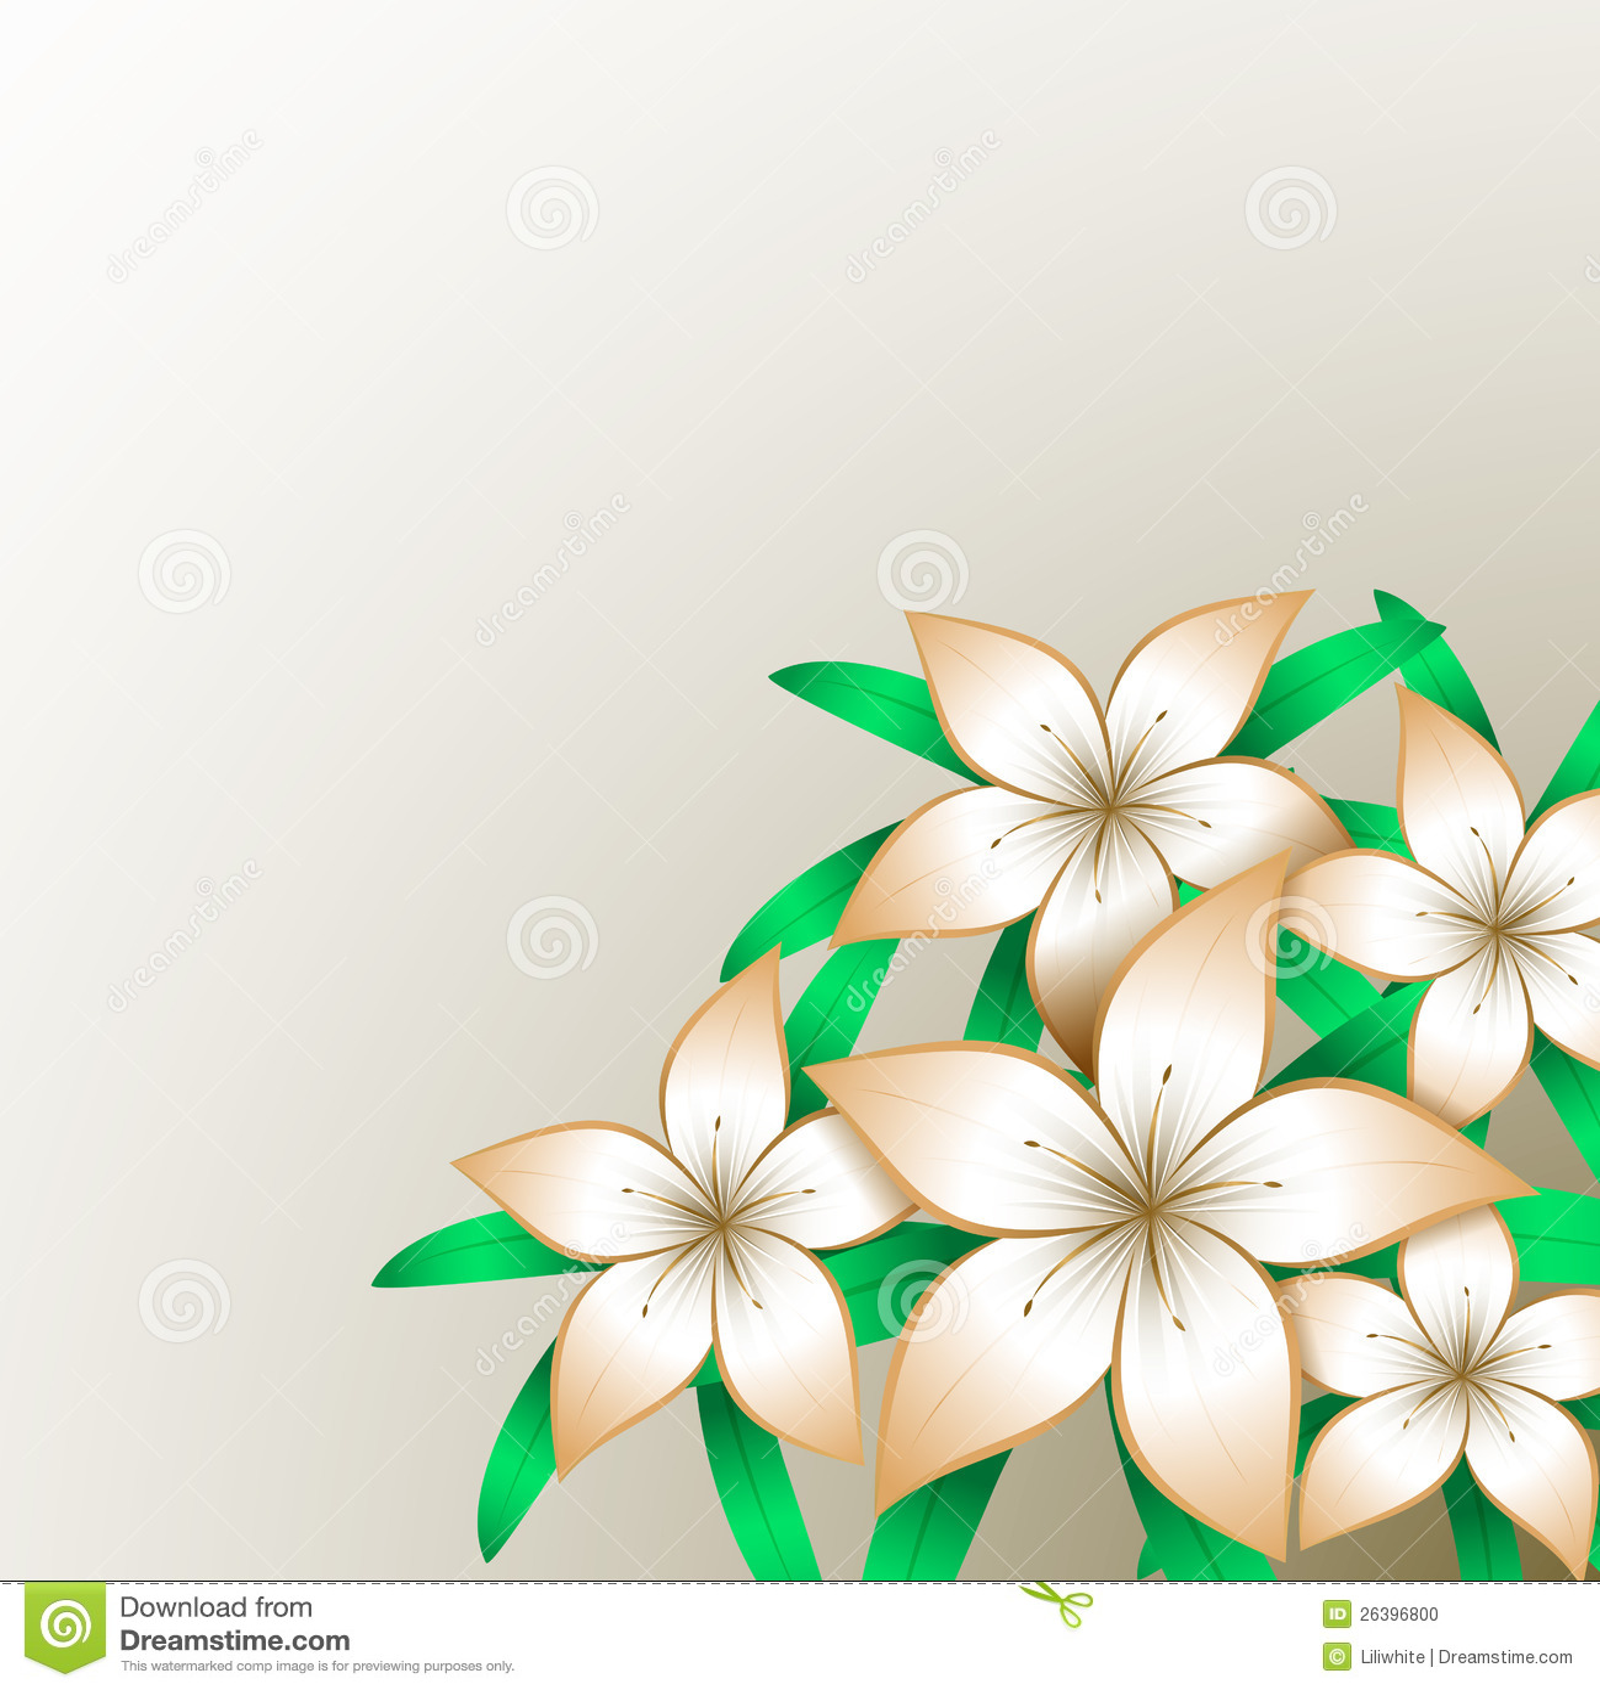 Jersey Lily Jersey Lily Clip Art Orange